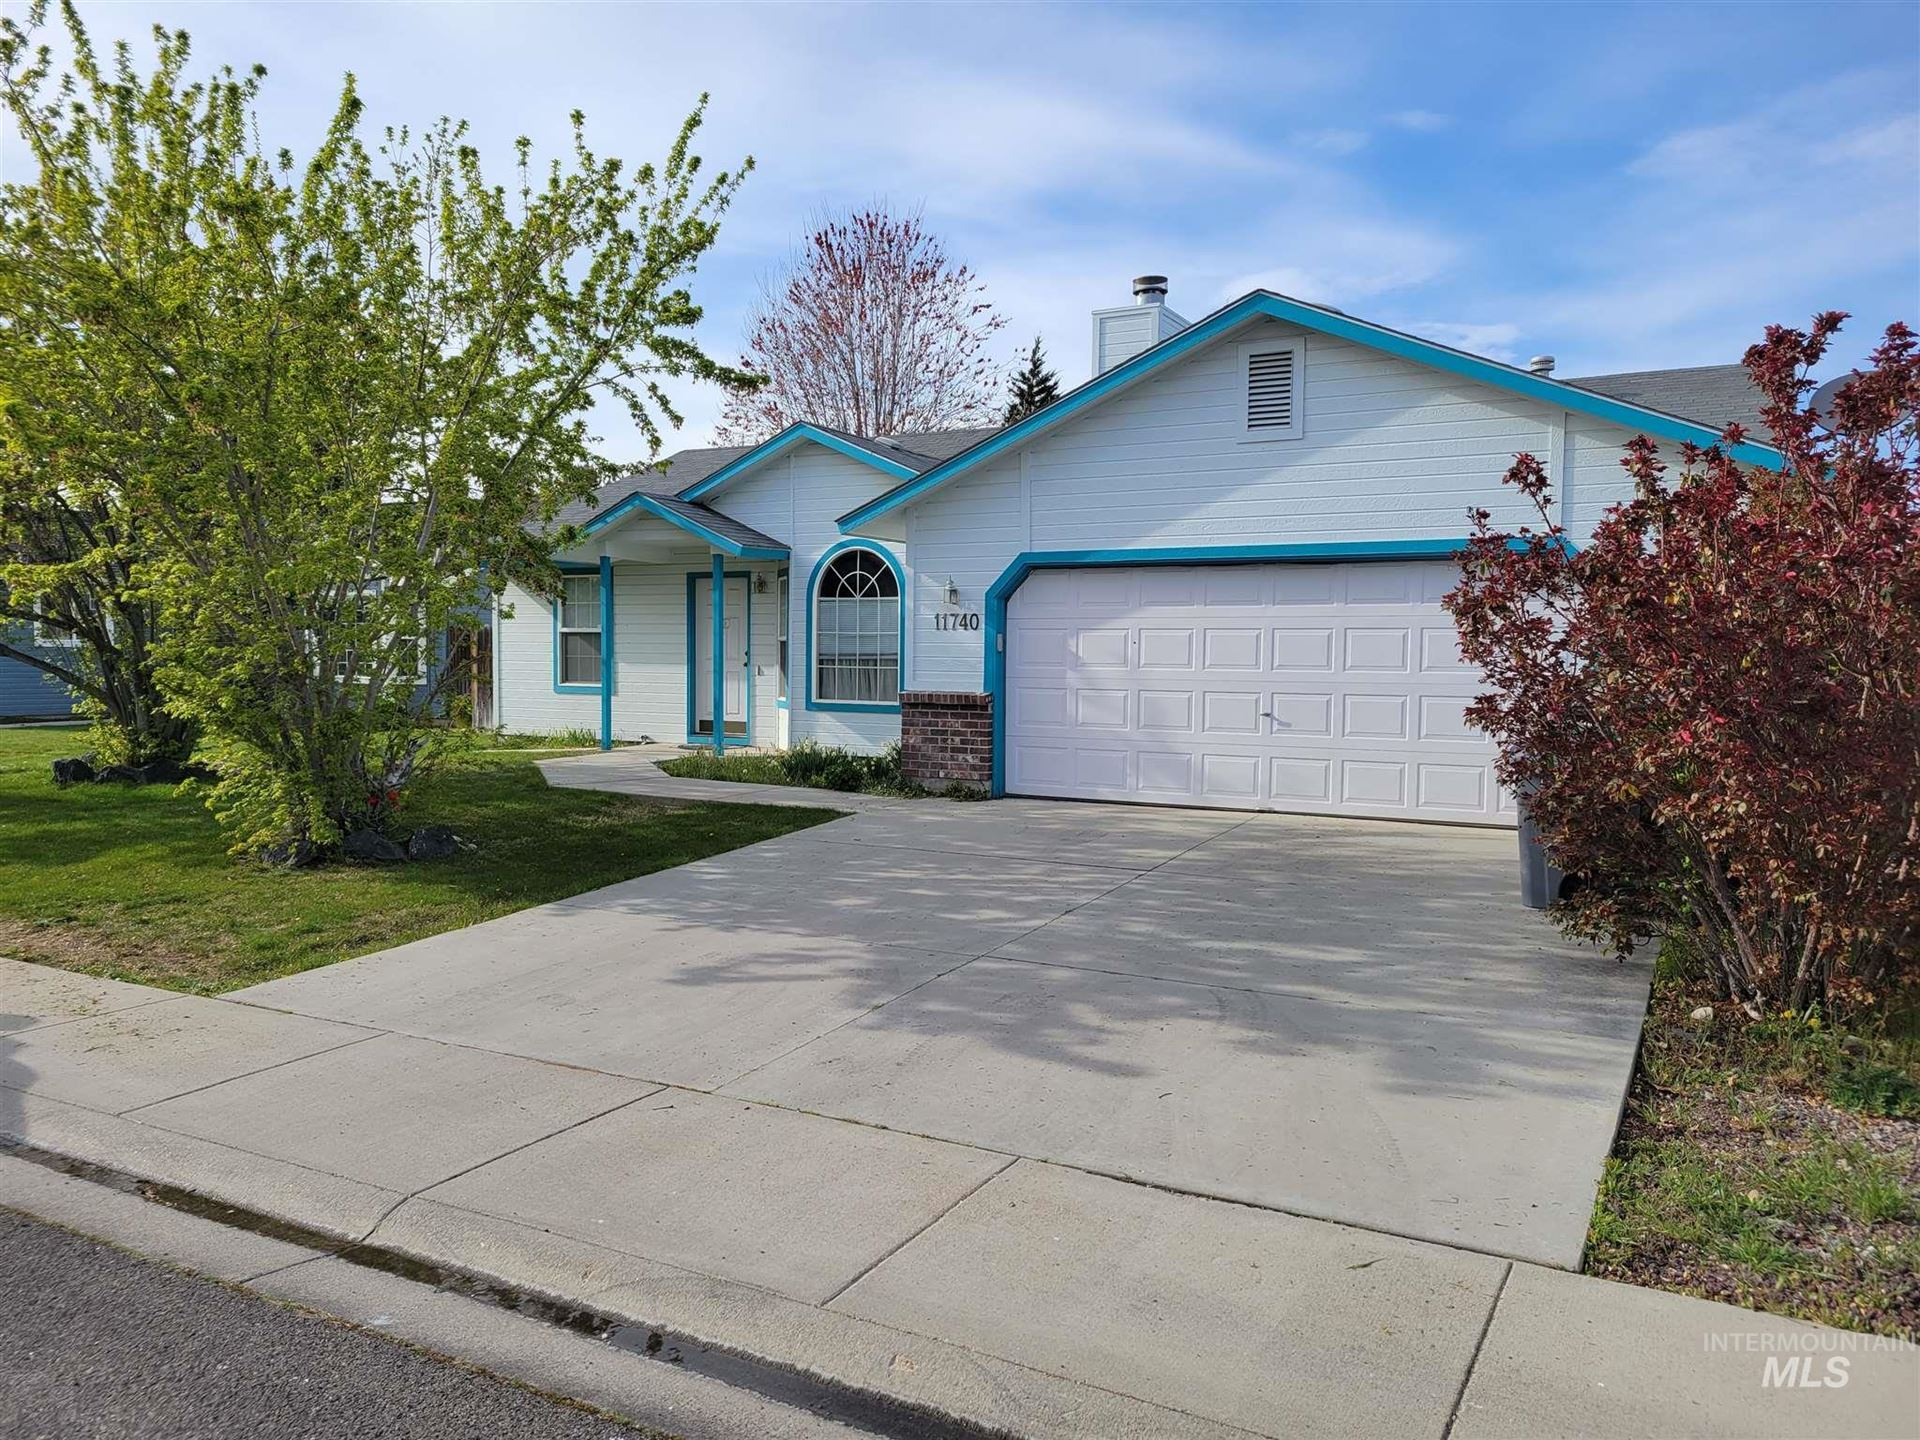 Photo of 11740 W Gabrielle Ct, Boise, ID 83713 (MLS # 98799737)